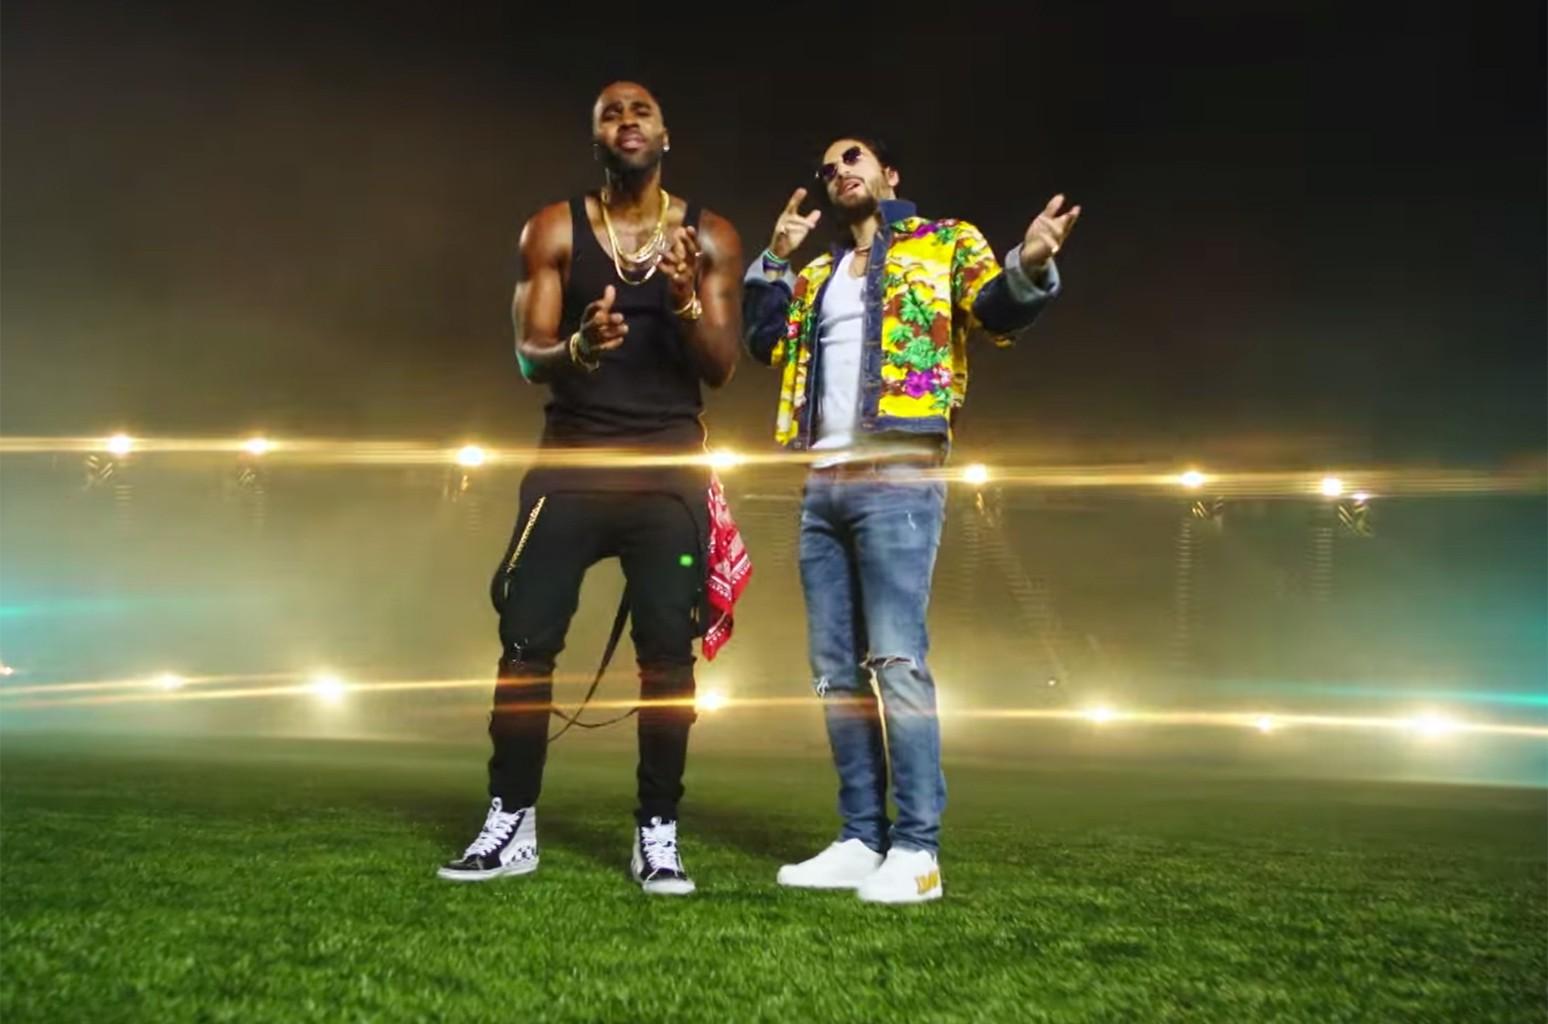 17 Best Soccer Songs, From Maluma, Shakira, Pitbull, Ricky Martin & More